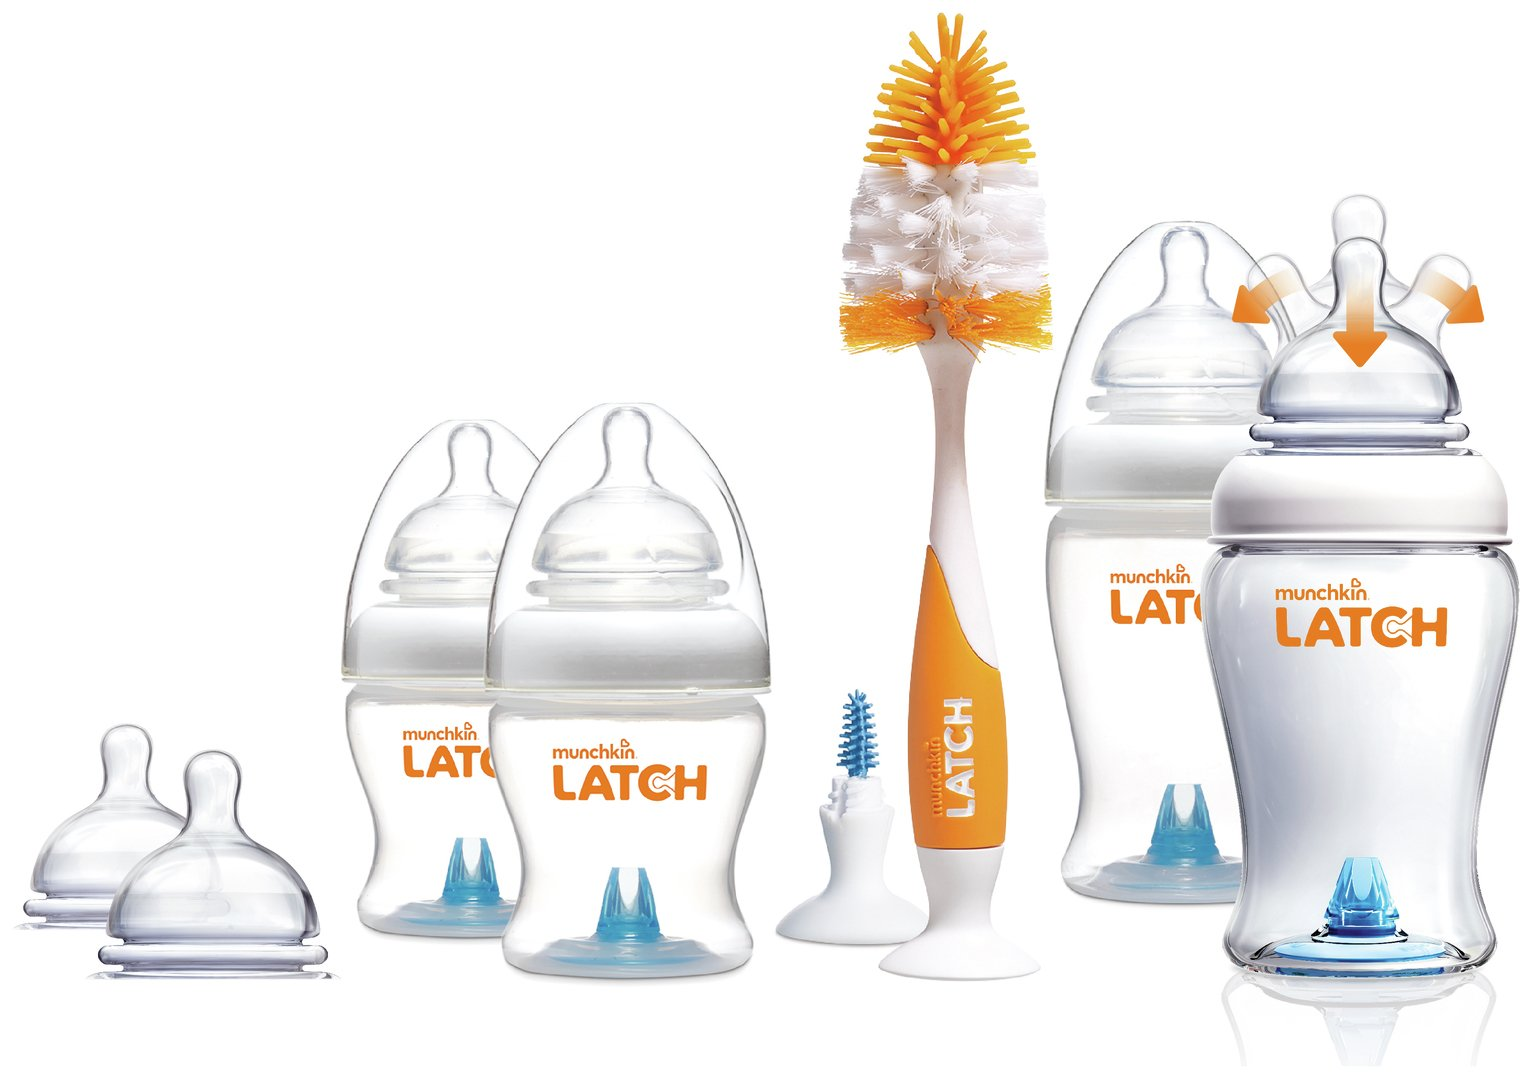 Image of Munchkin Latch Newborn Bottle and Teats Starter Set